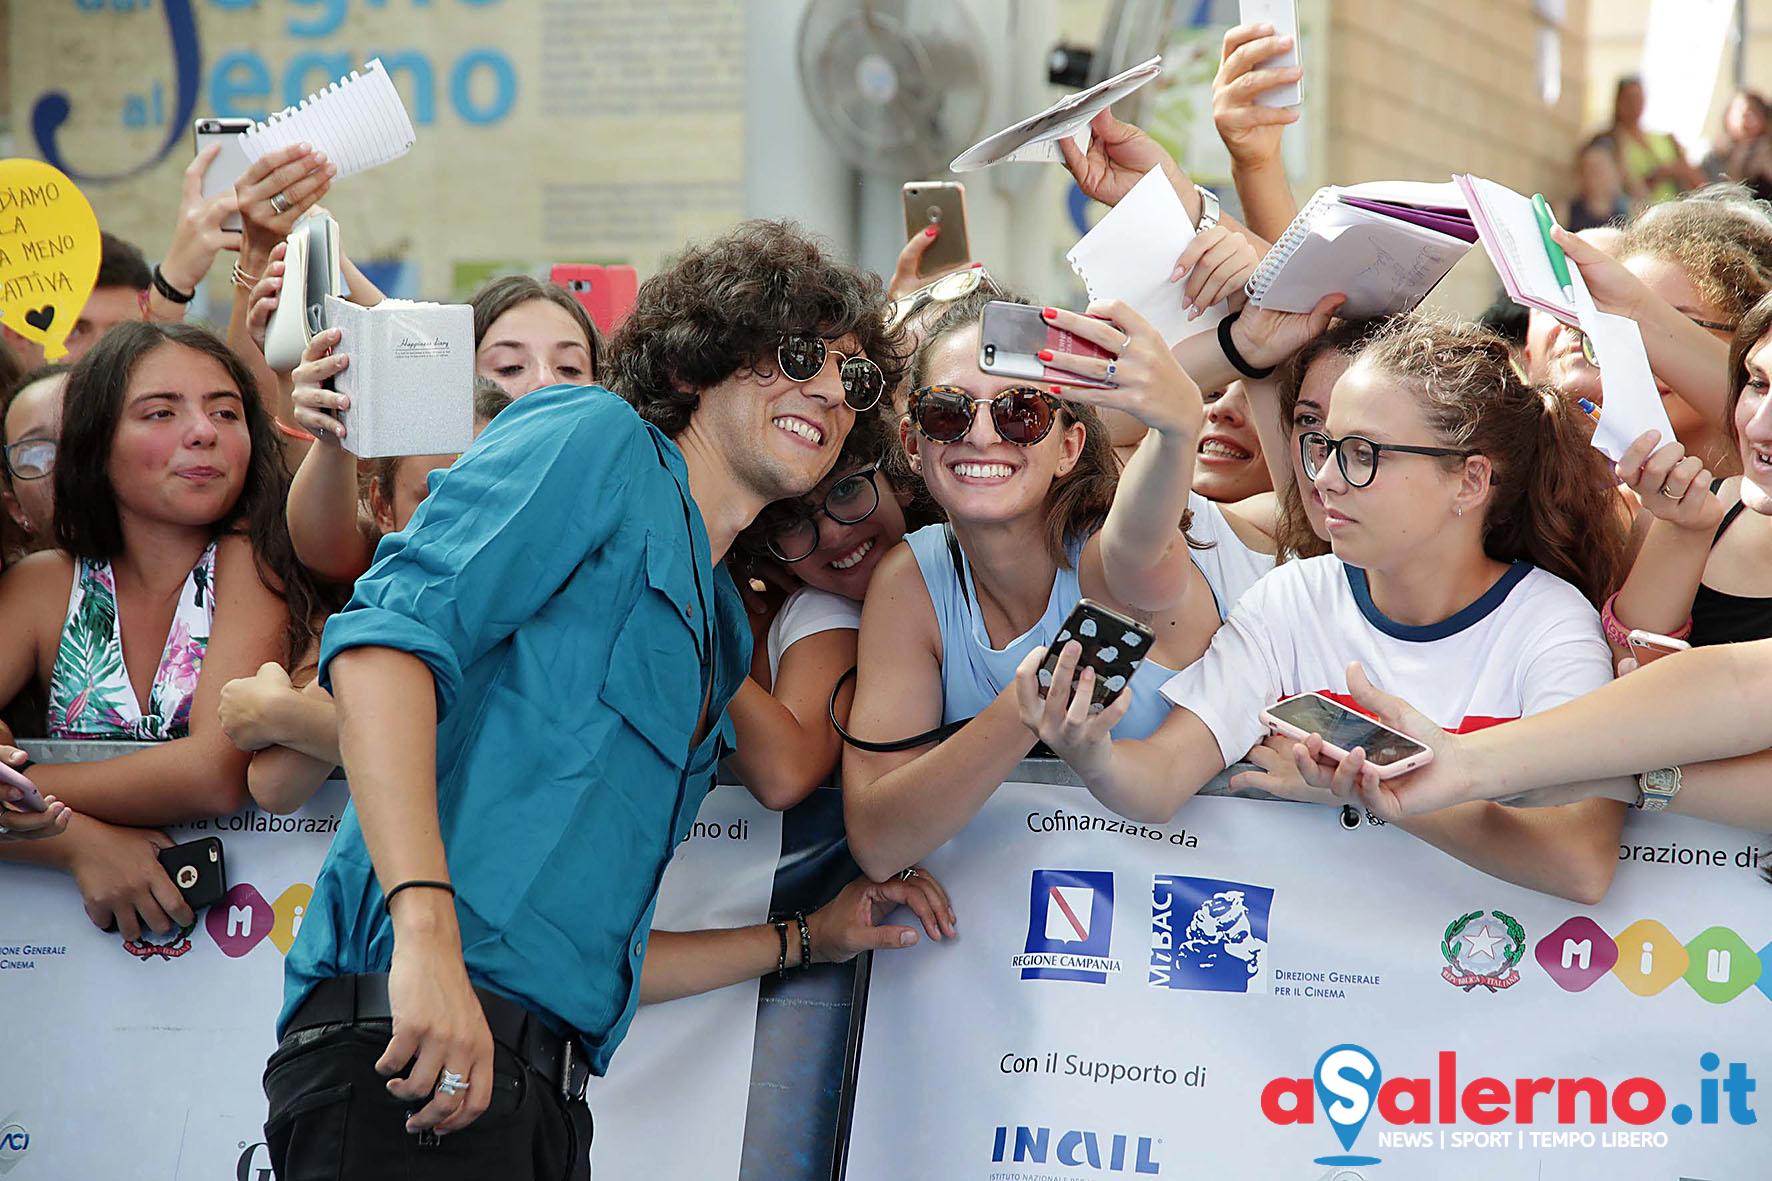 SAL - 21 07 2018 Giffoni Film Festival. Nella foto Ermal Meta. Foto Tanopress